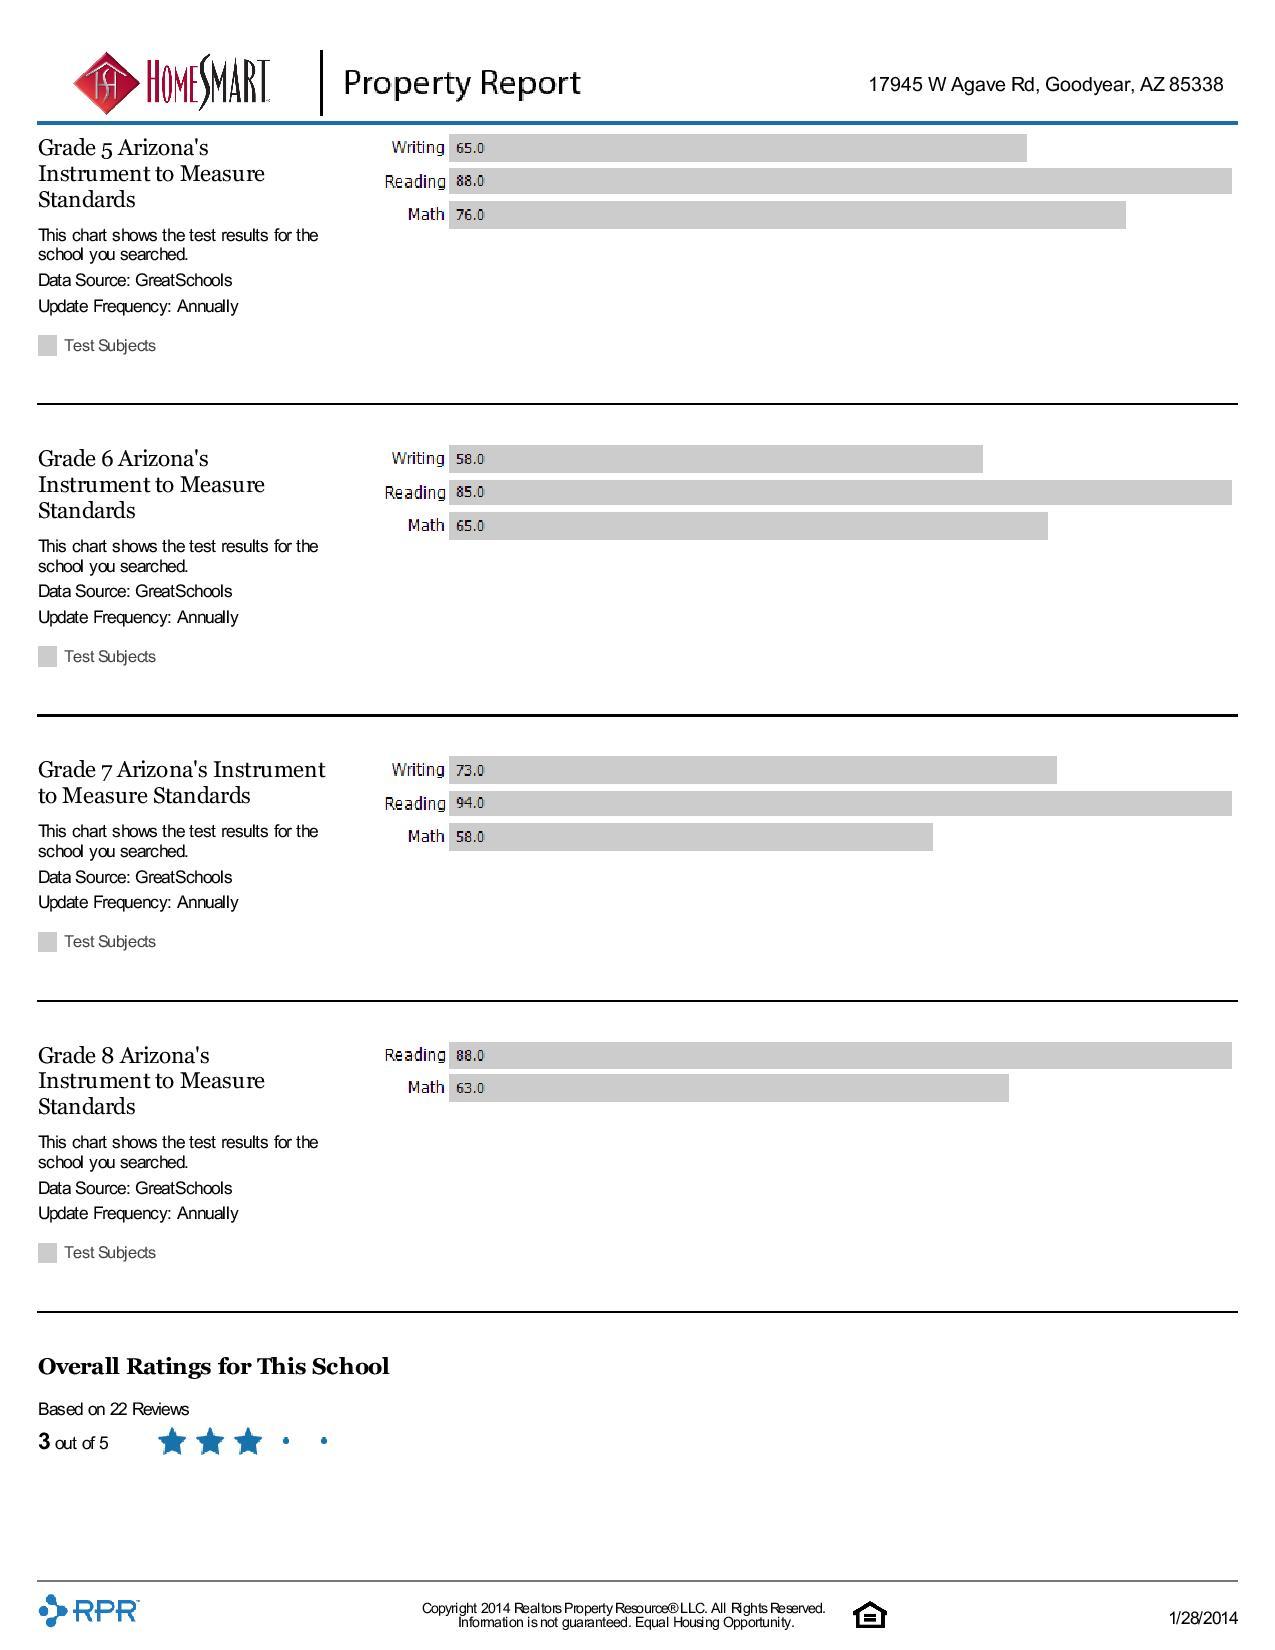 17945-W-Agave-Rd-Goodyear-AZ-85338.pdf-page-016